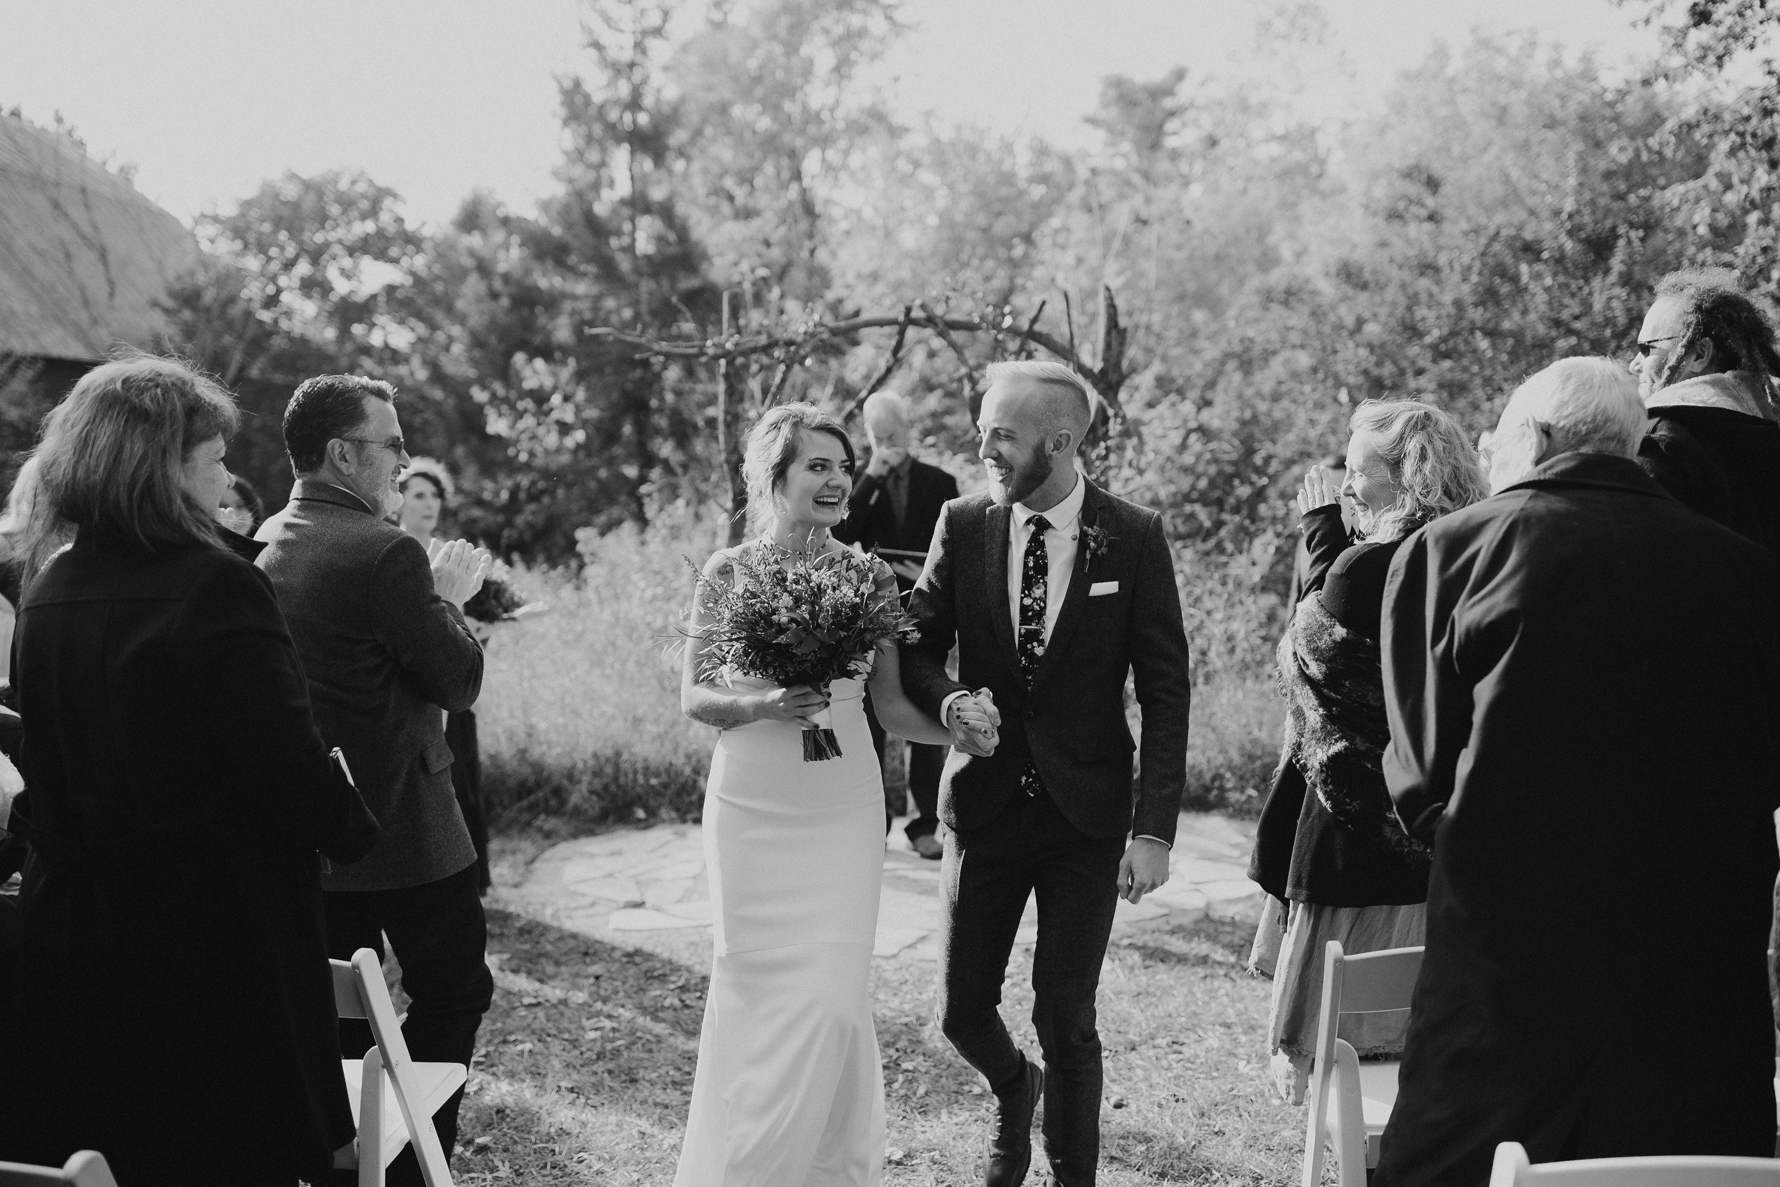 norris-traverse-city-wedding-50.JPG